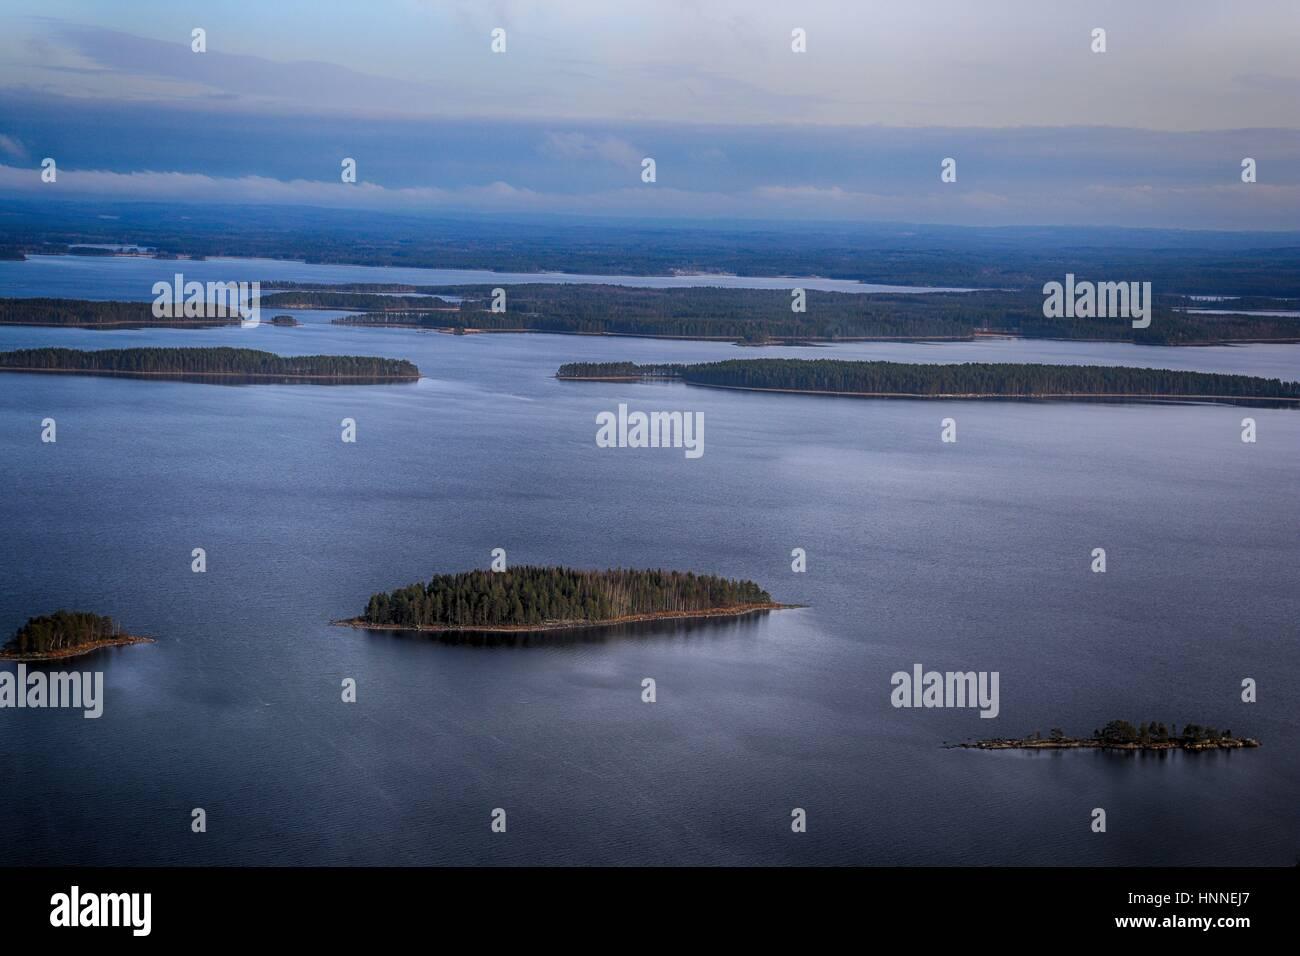 Scenery from Koli National Park (Kolin kansallispuisto) in Finland, North Karelia: Pielinen Lake in Koli National - Stock Image